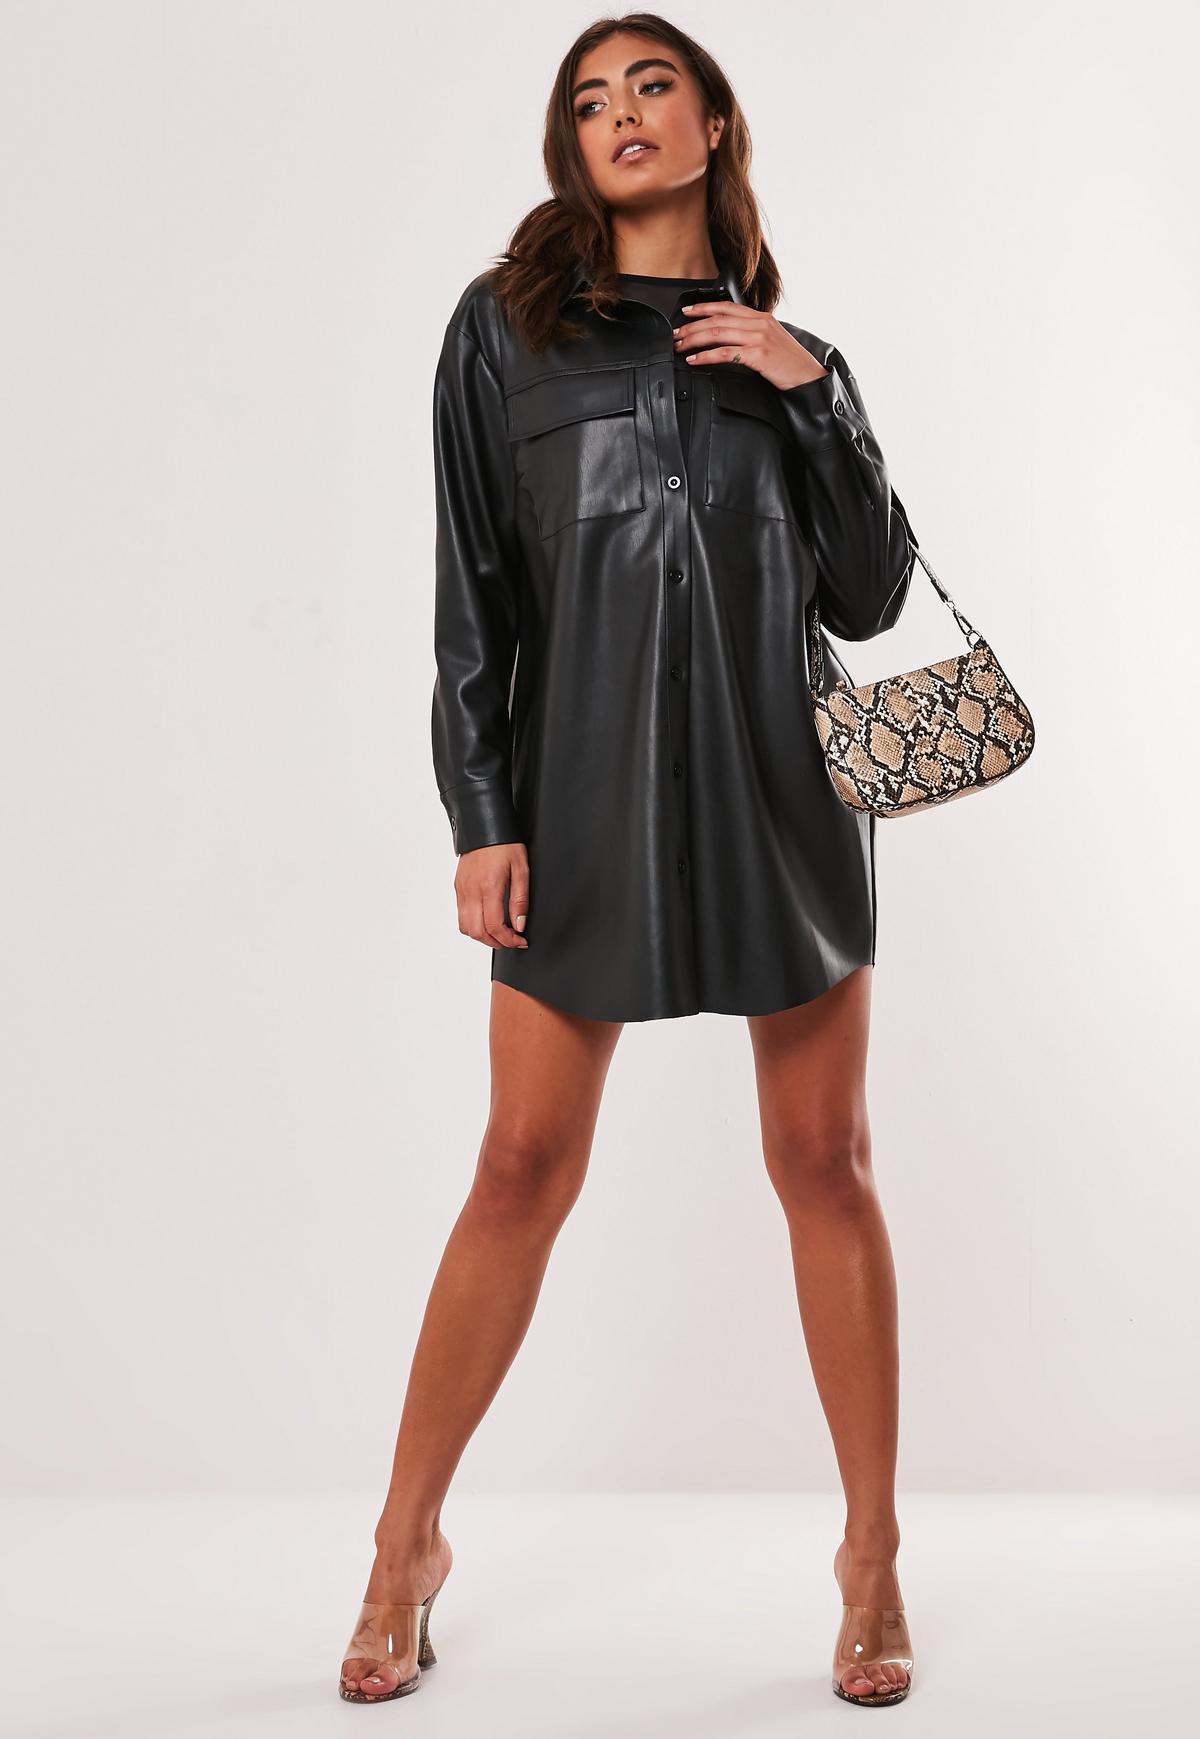 Black Faux Leather Oversized Shirt Dress